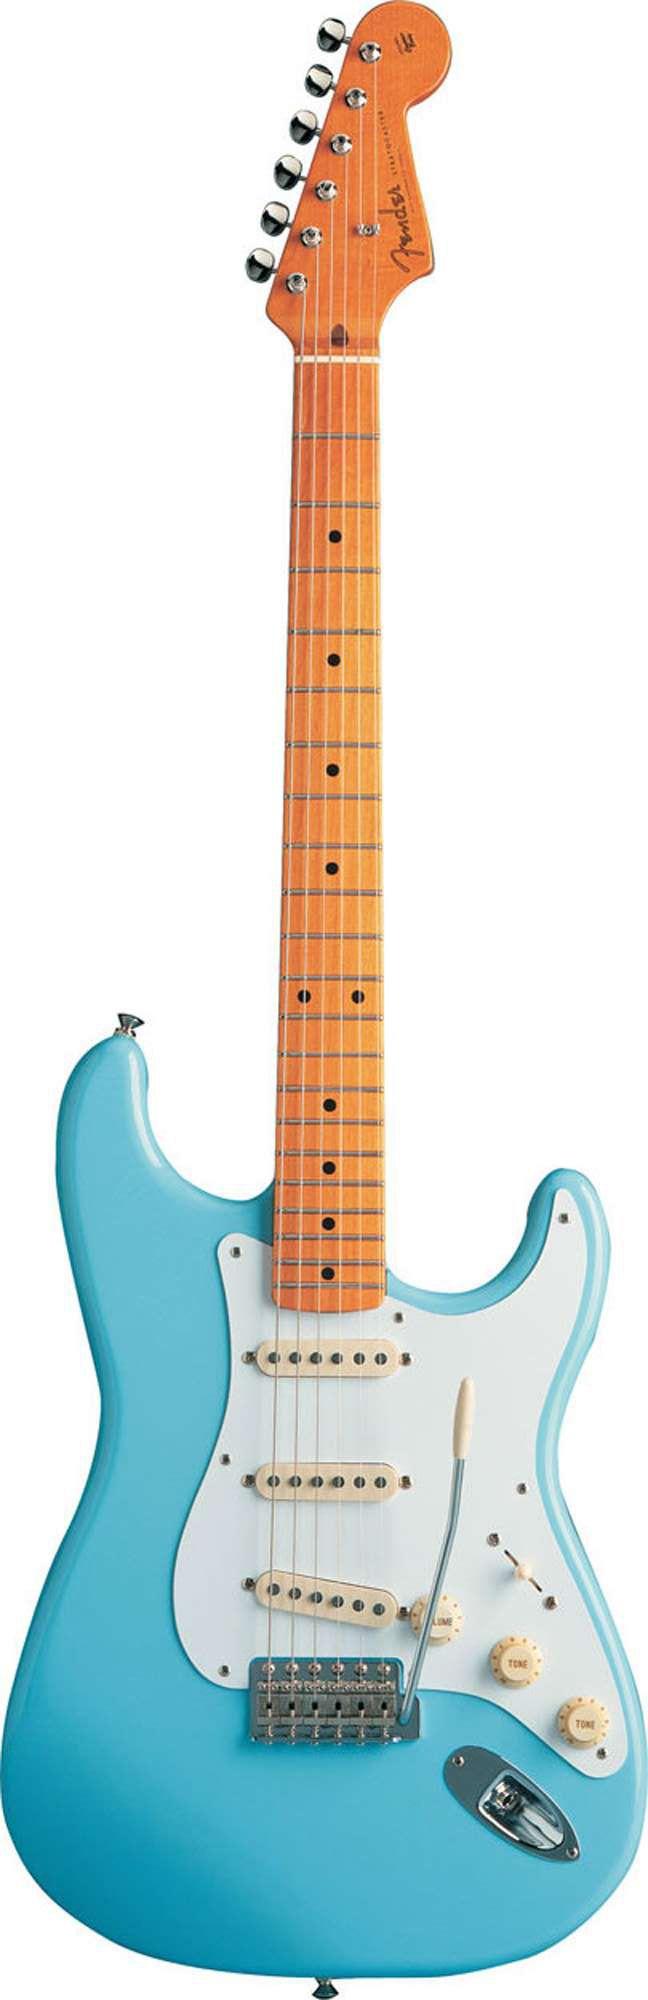 2013 Daphne Blue FENDER Stratocaster MIM - Peter Florance pick ups #fenderguitars